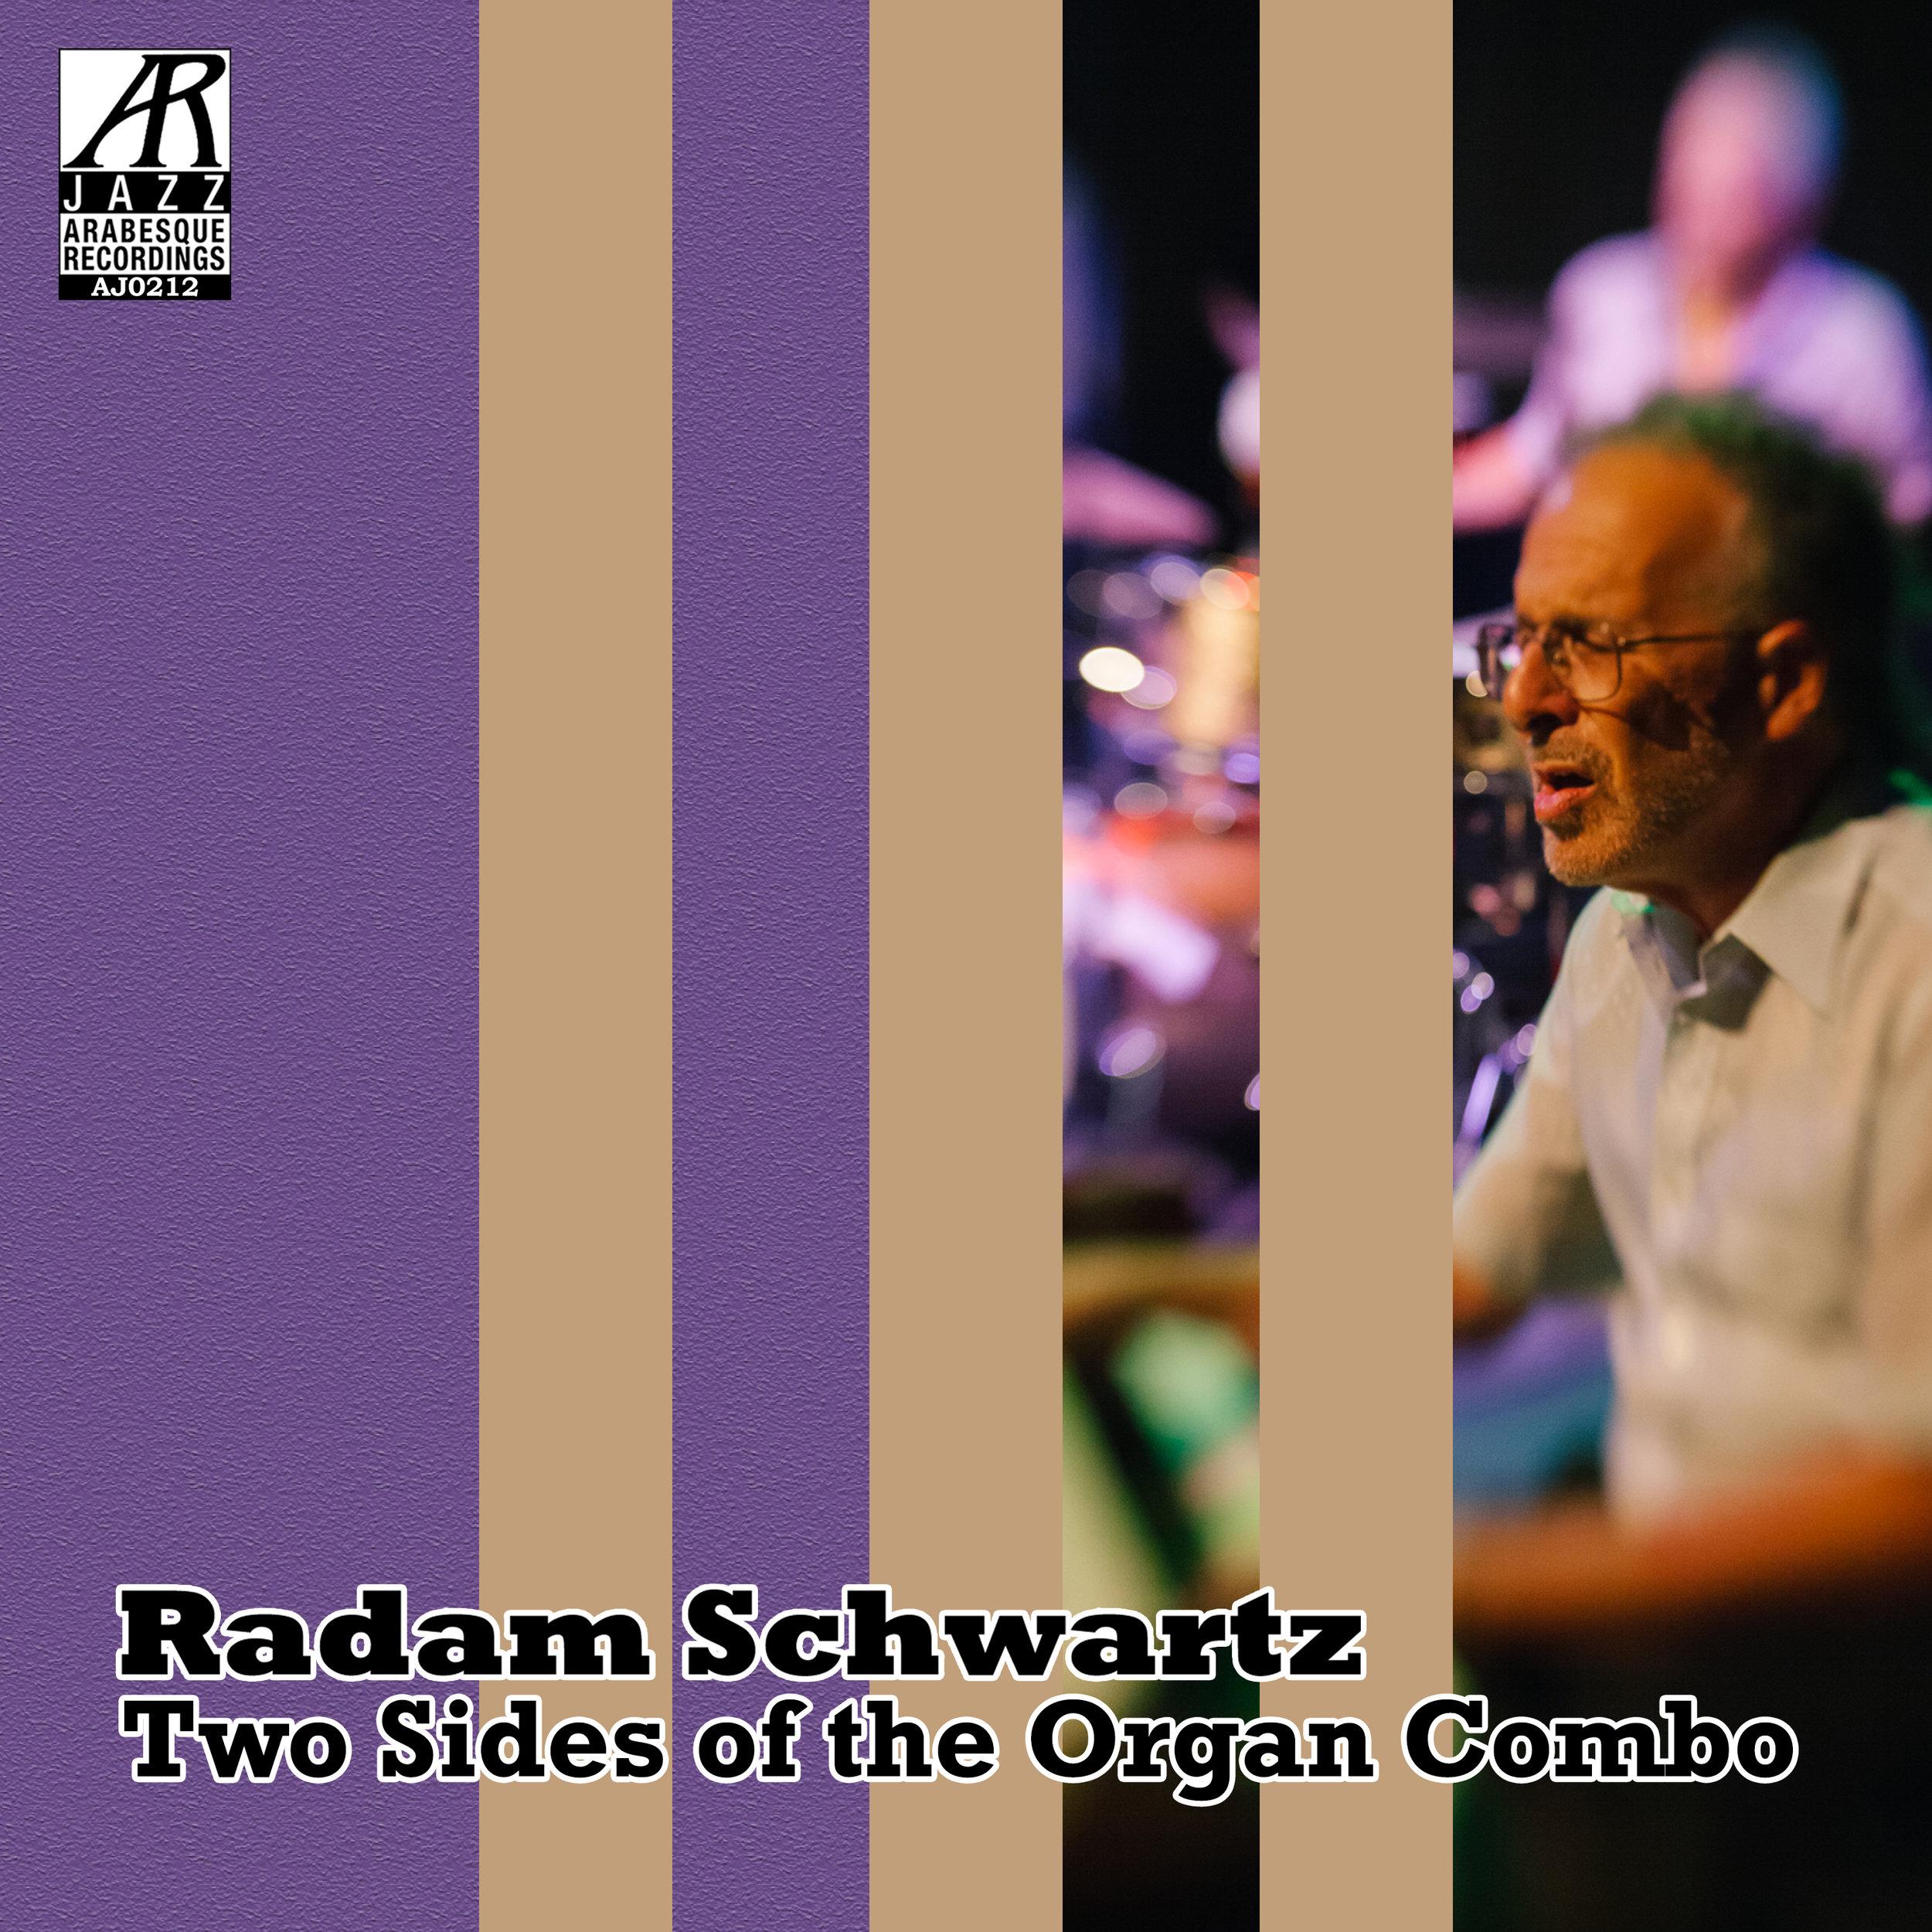 AJ0212 - Radam Schwartz - Two Sides of the Combo Organ 3000x3000.jpg